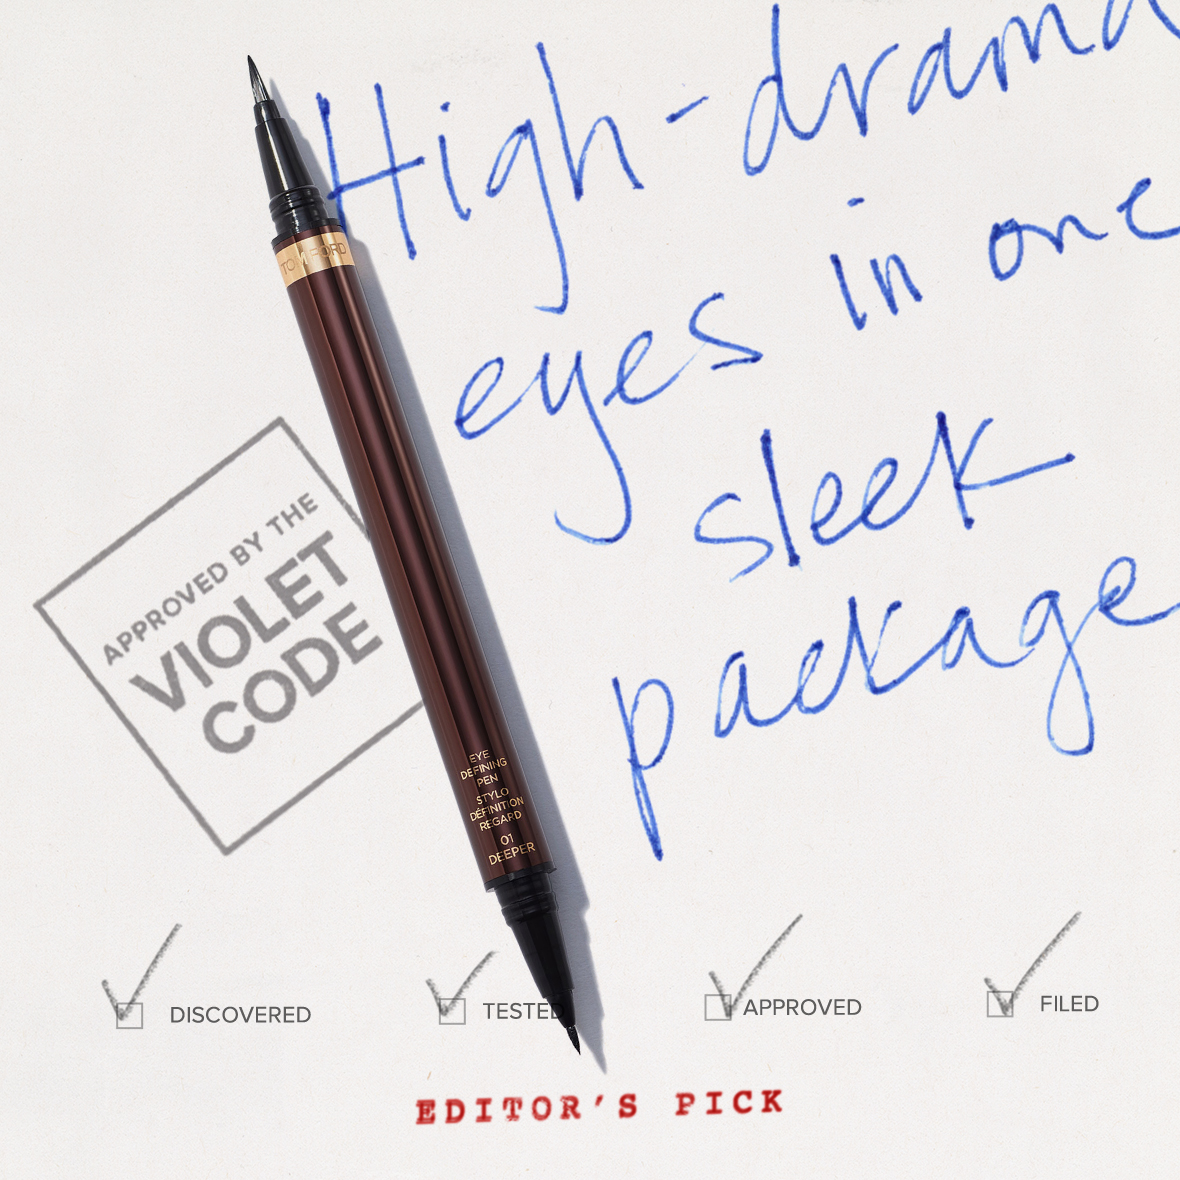 ABTVC-Social-Editors-Pick-TomFord-Eye-Defining-Pen.jpg